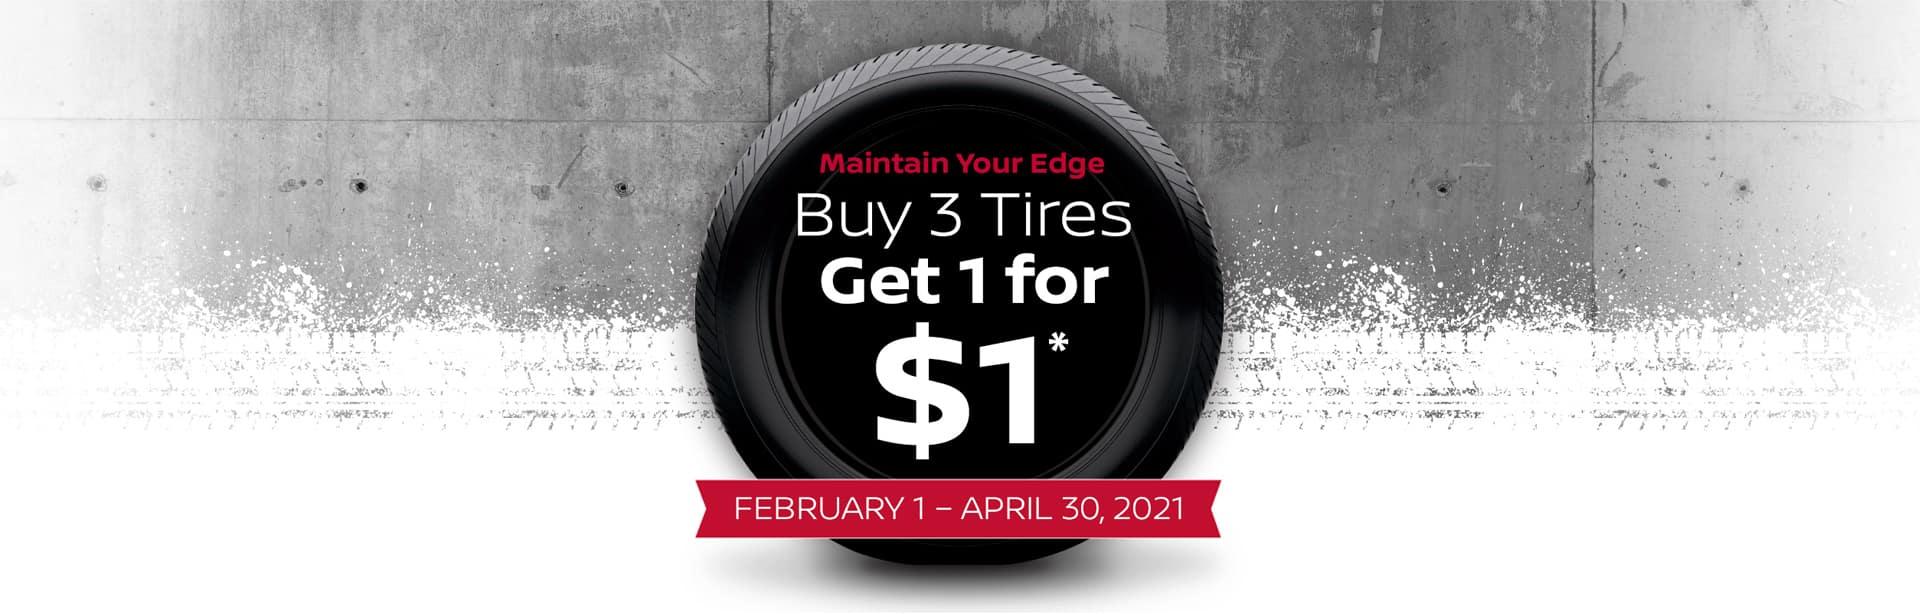 Tires_Feb21